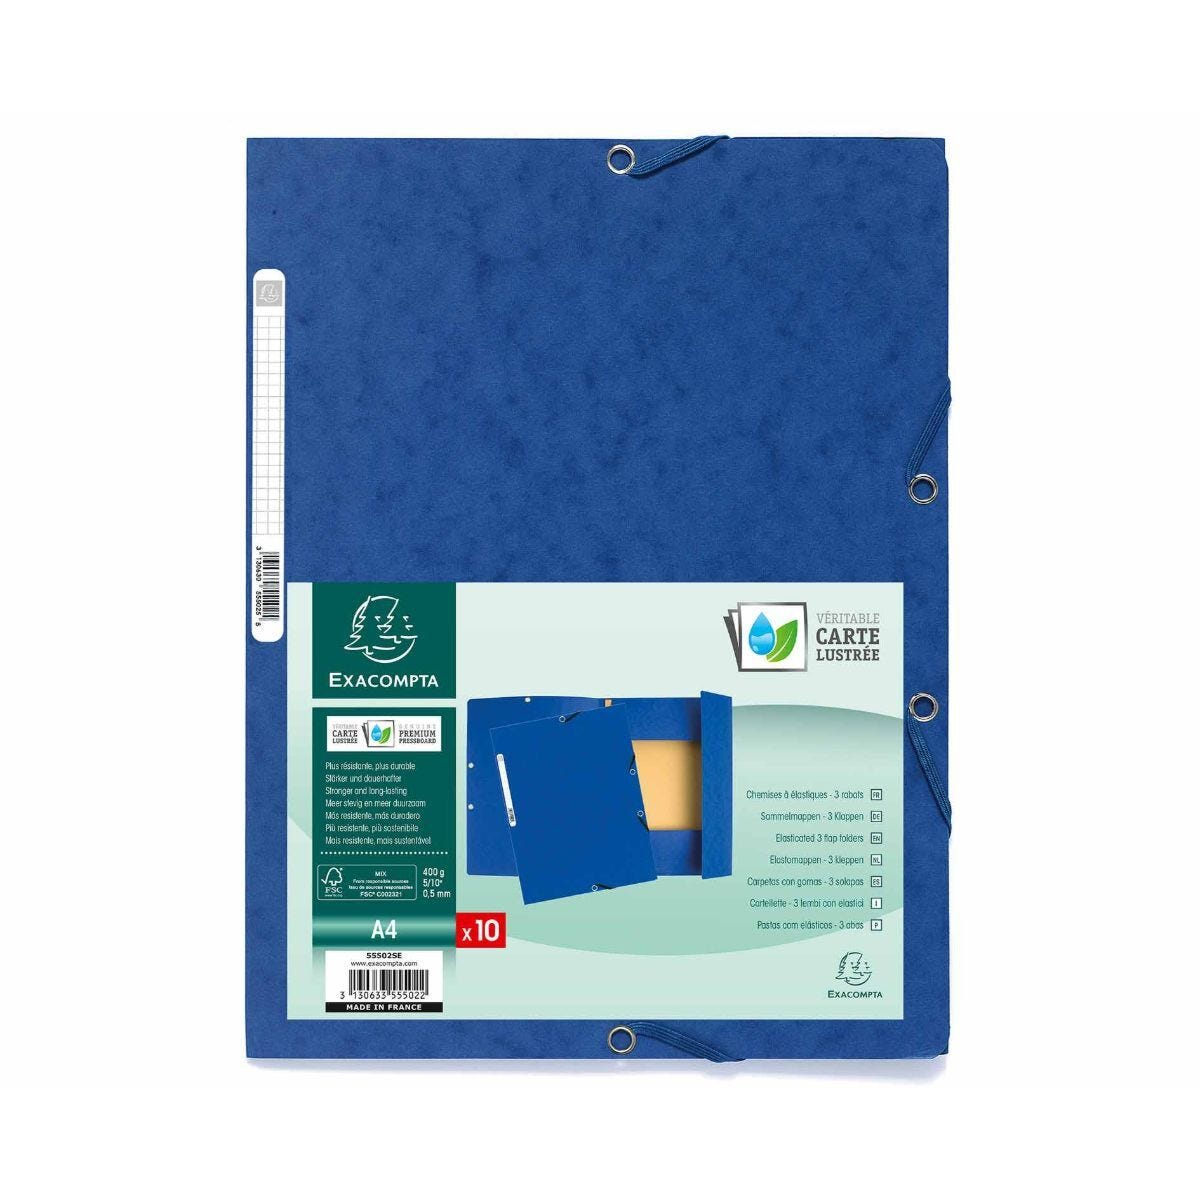 Exacompta Europa 3 Flap Elastic Folder A4 Pack of 50 400gsm Blue